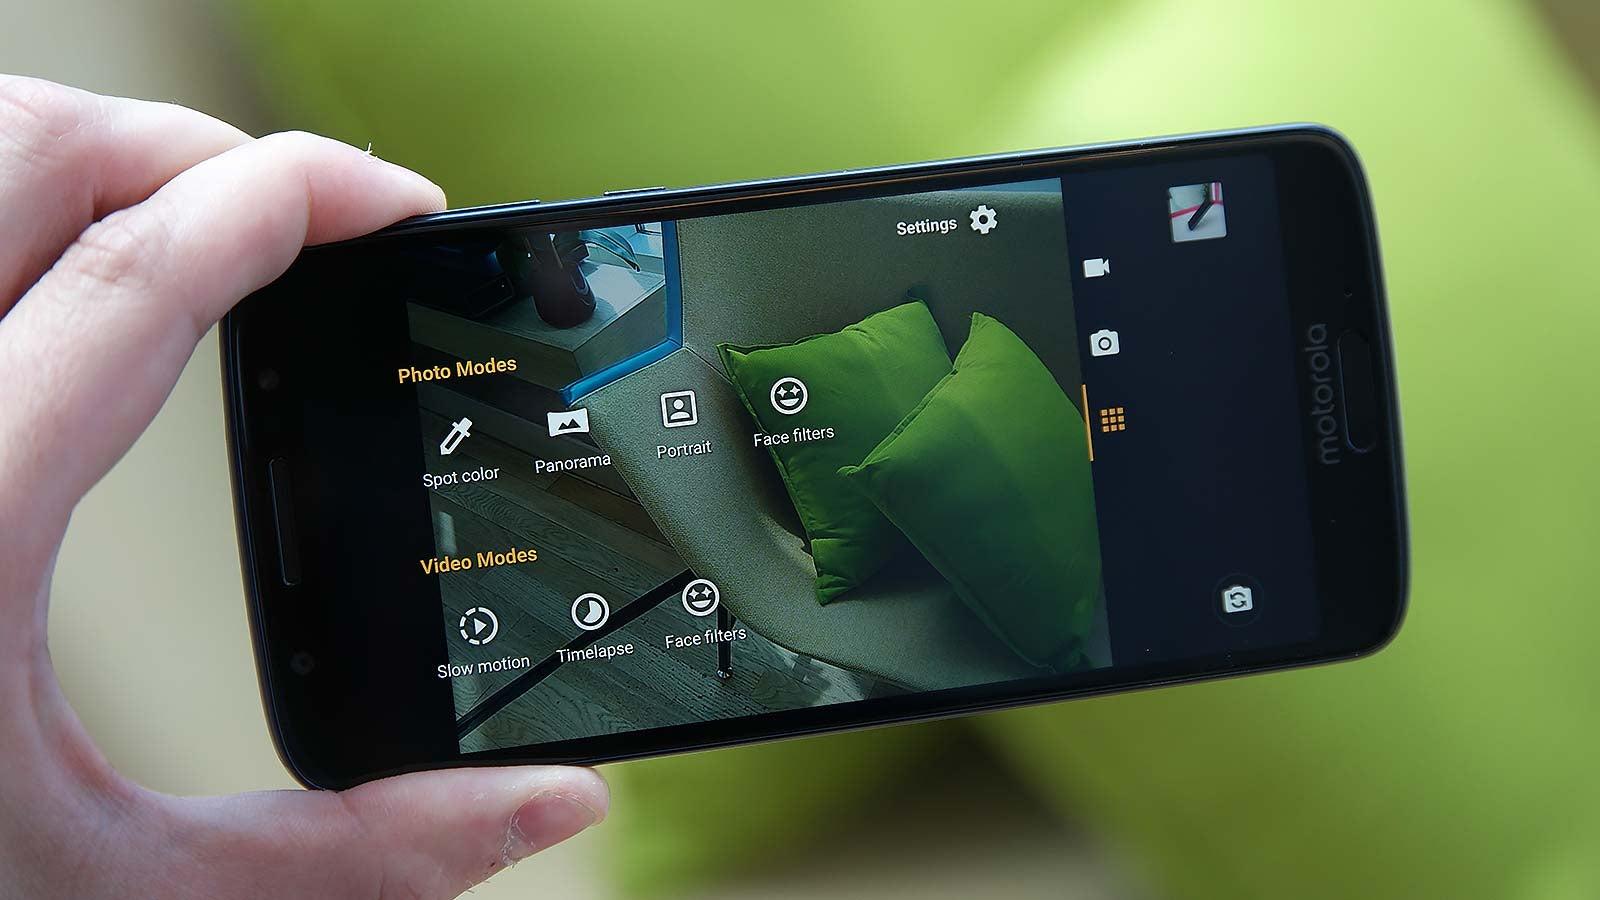 How To Unlock Moto G Screen Lock